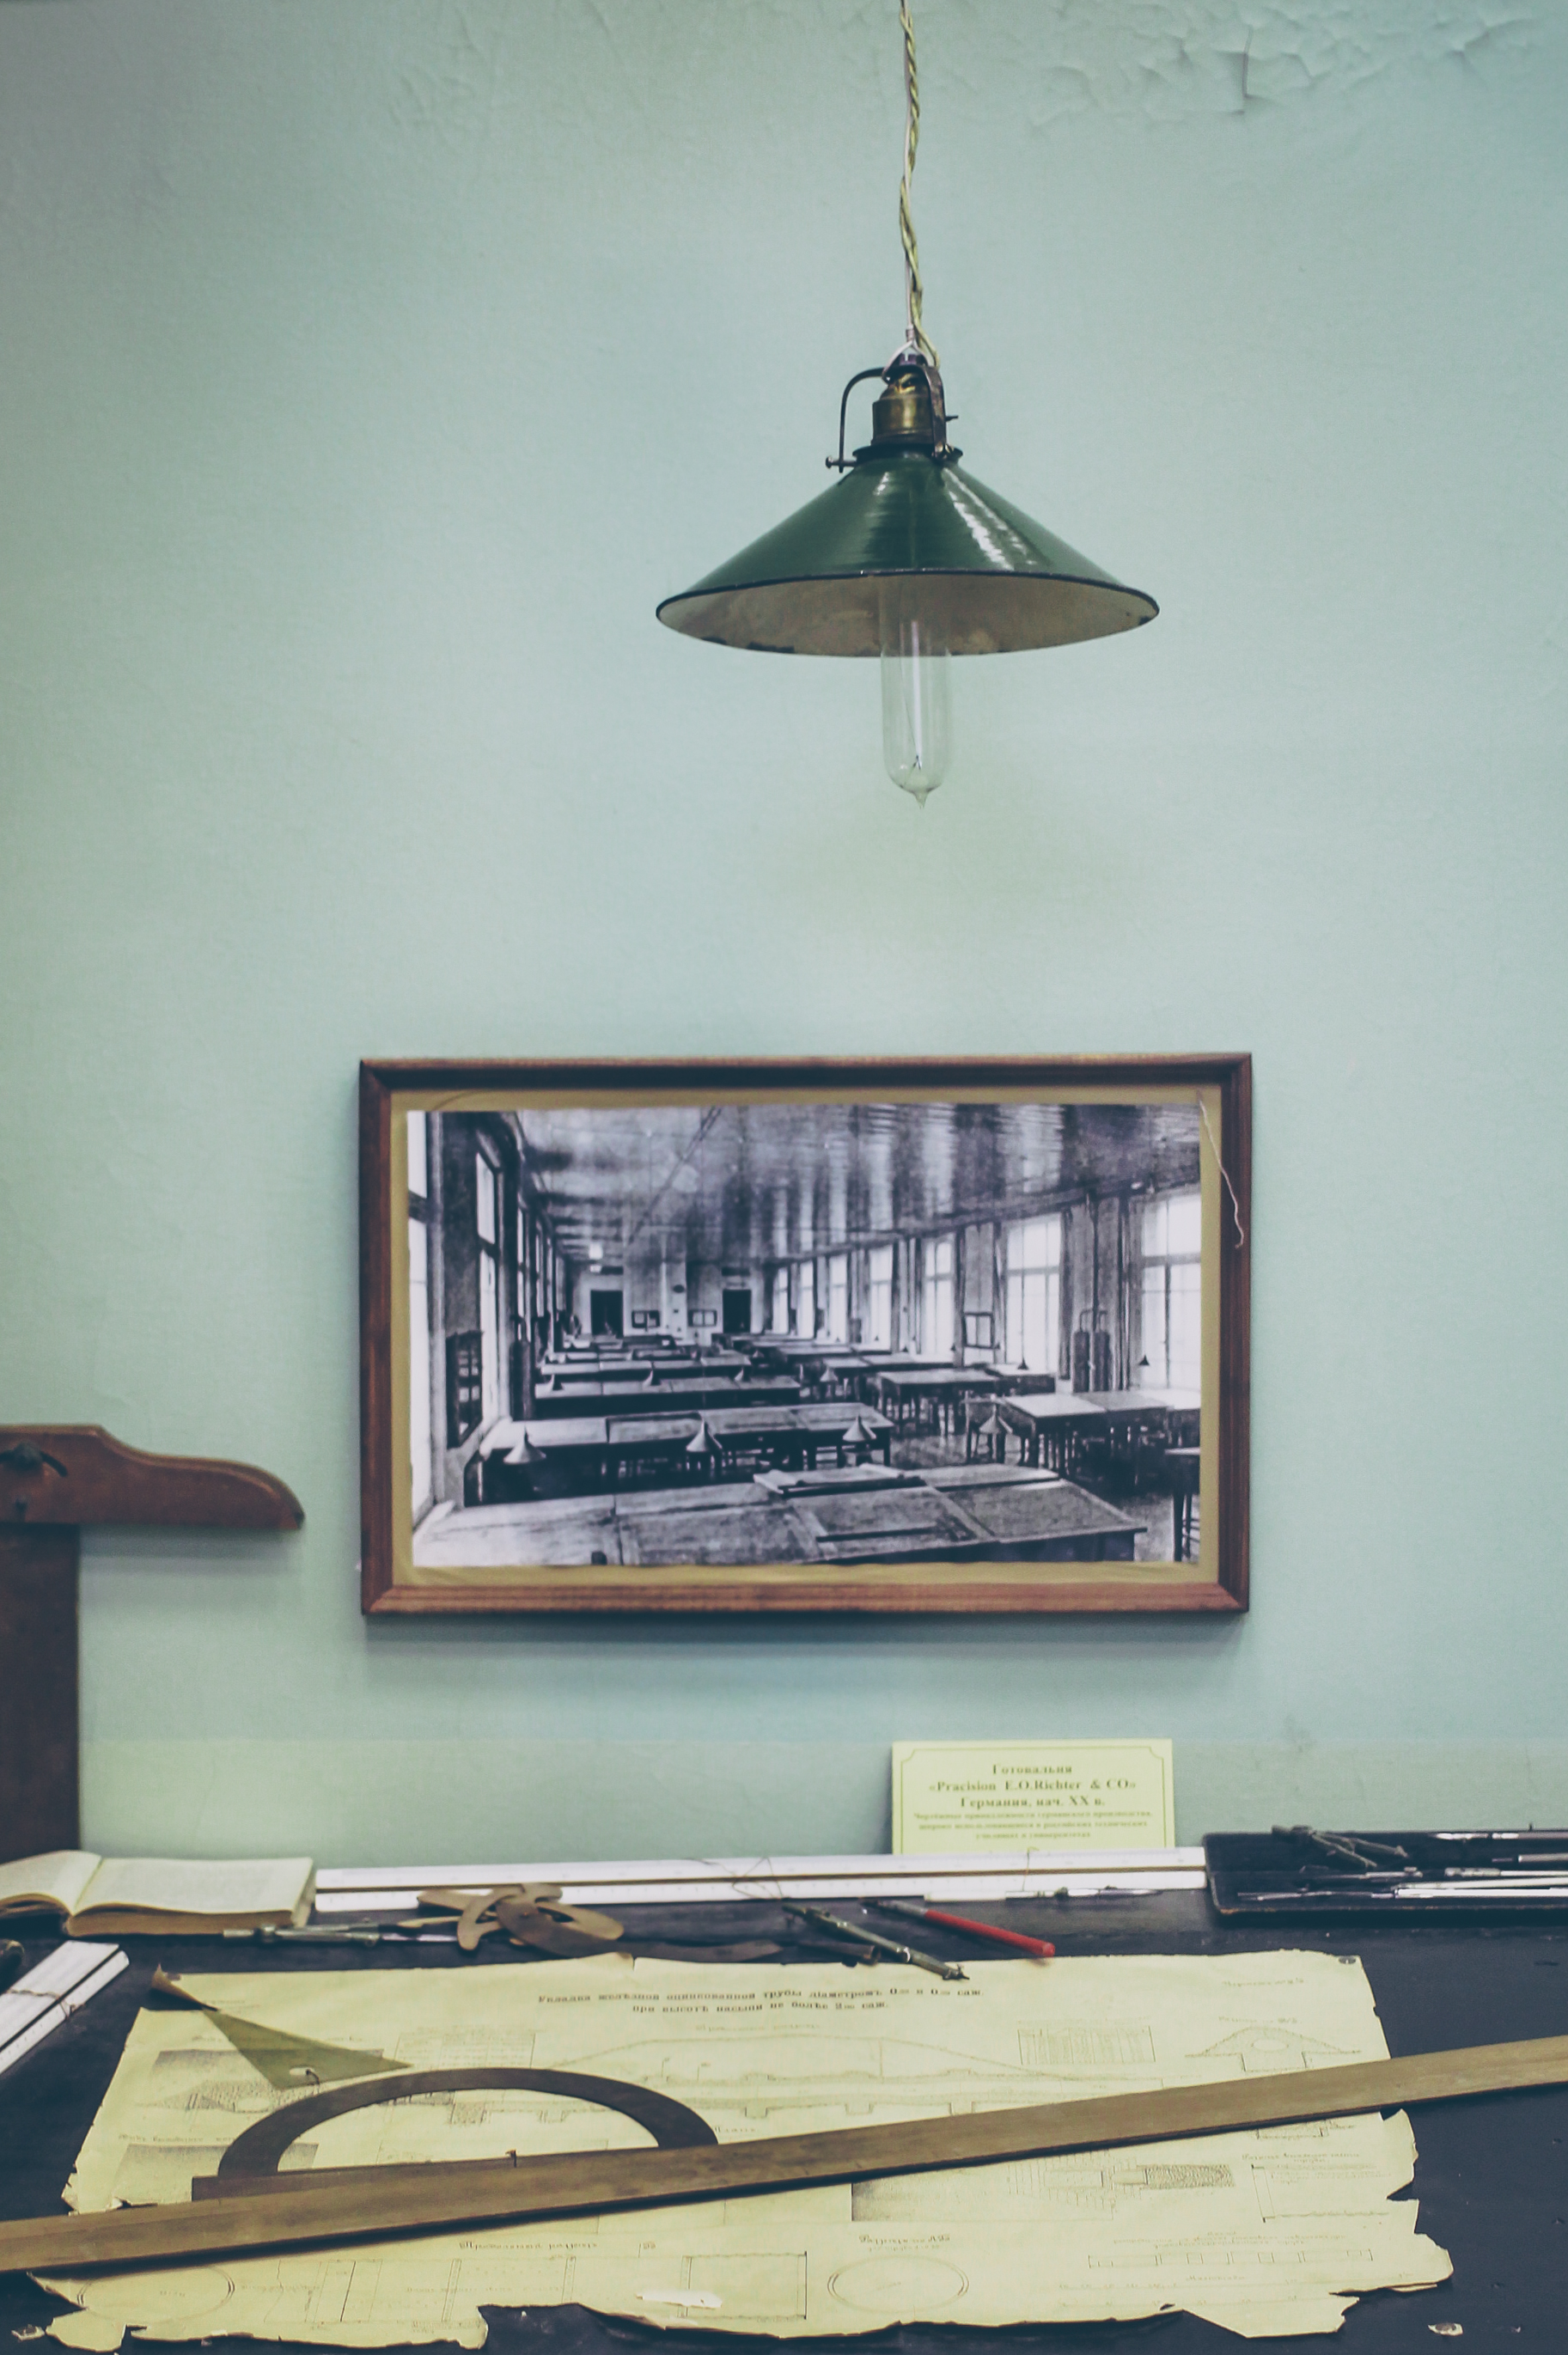 Old Desk, Books, Building, Desk, Notes, HQ Photo